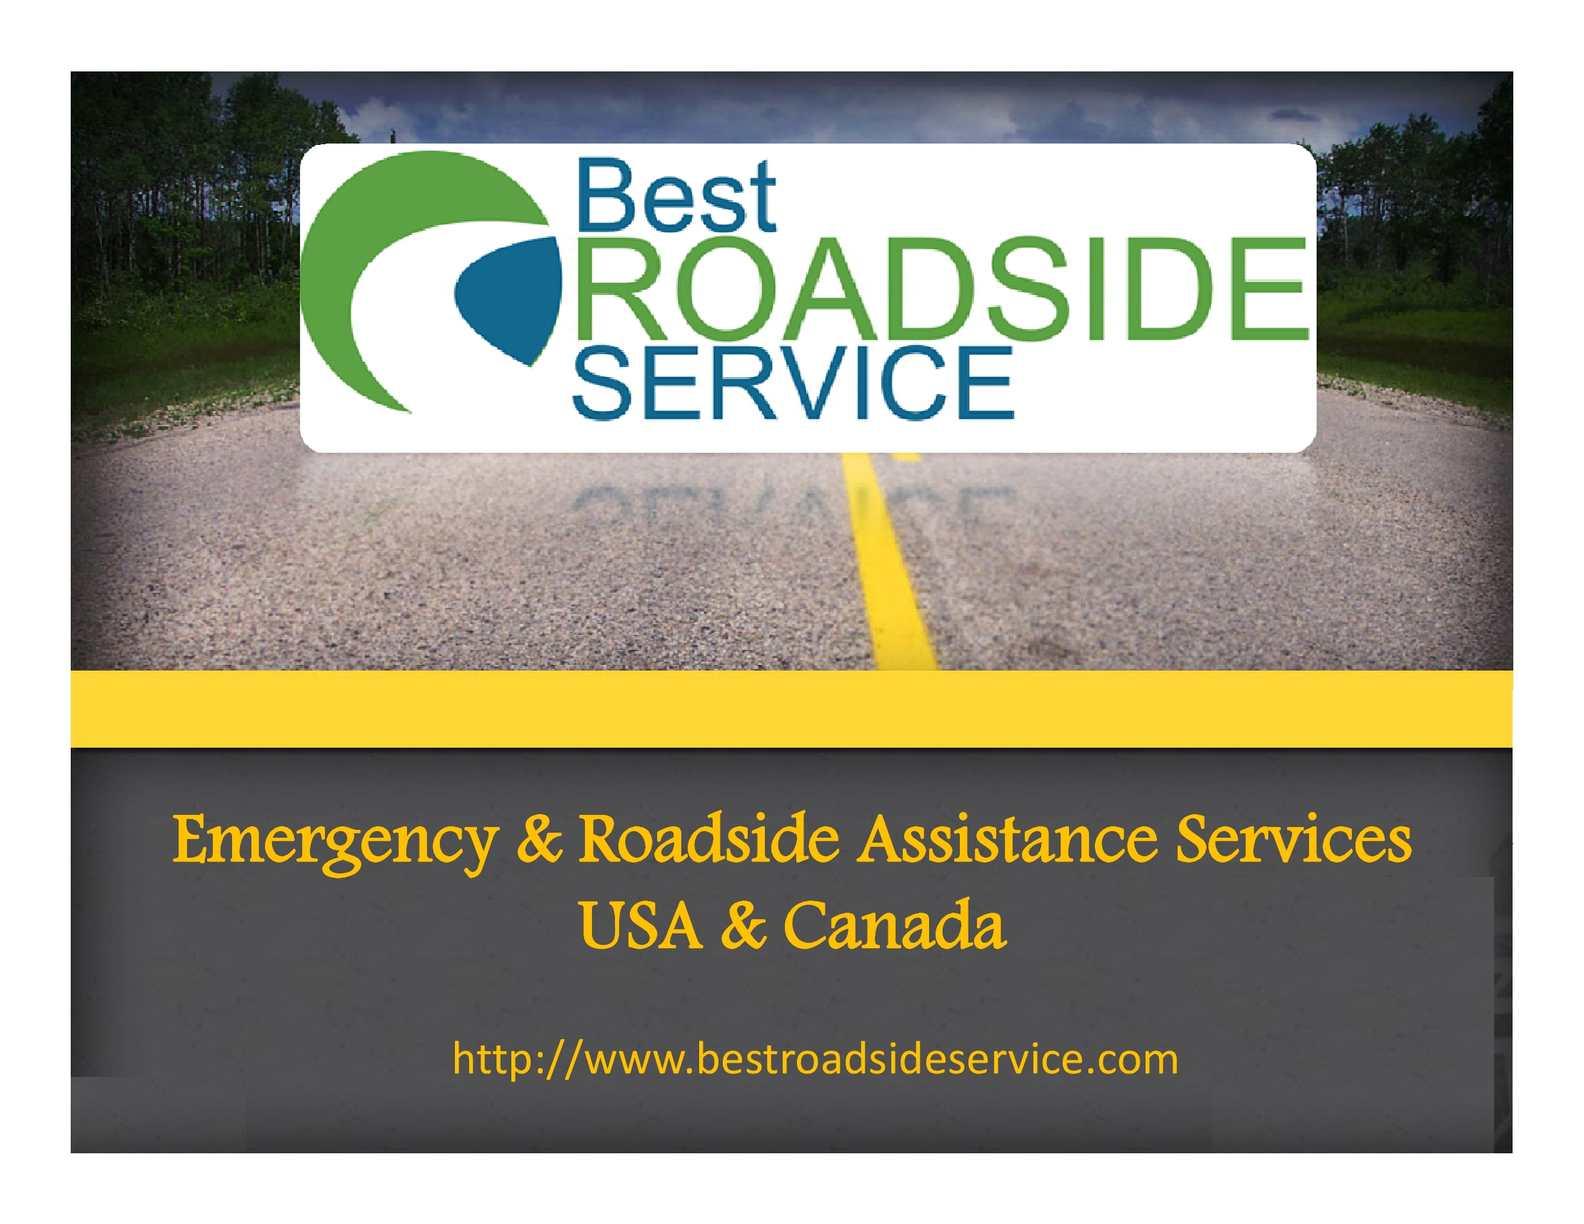 Calaméo - Best Roadside Services - Towing, Flat Tire Repair